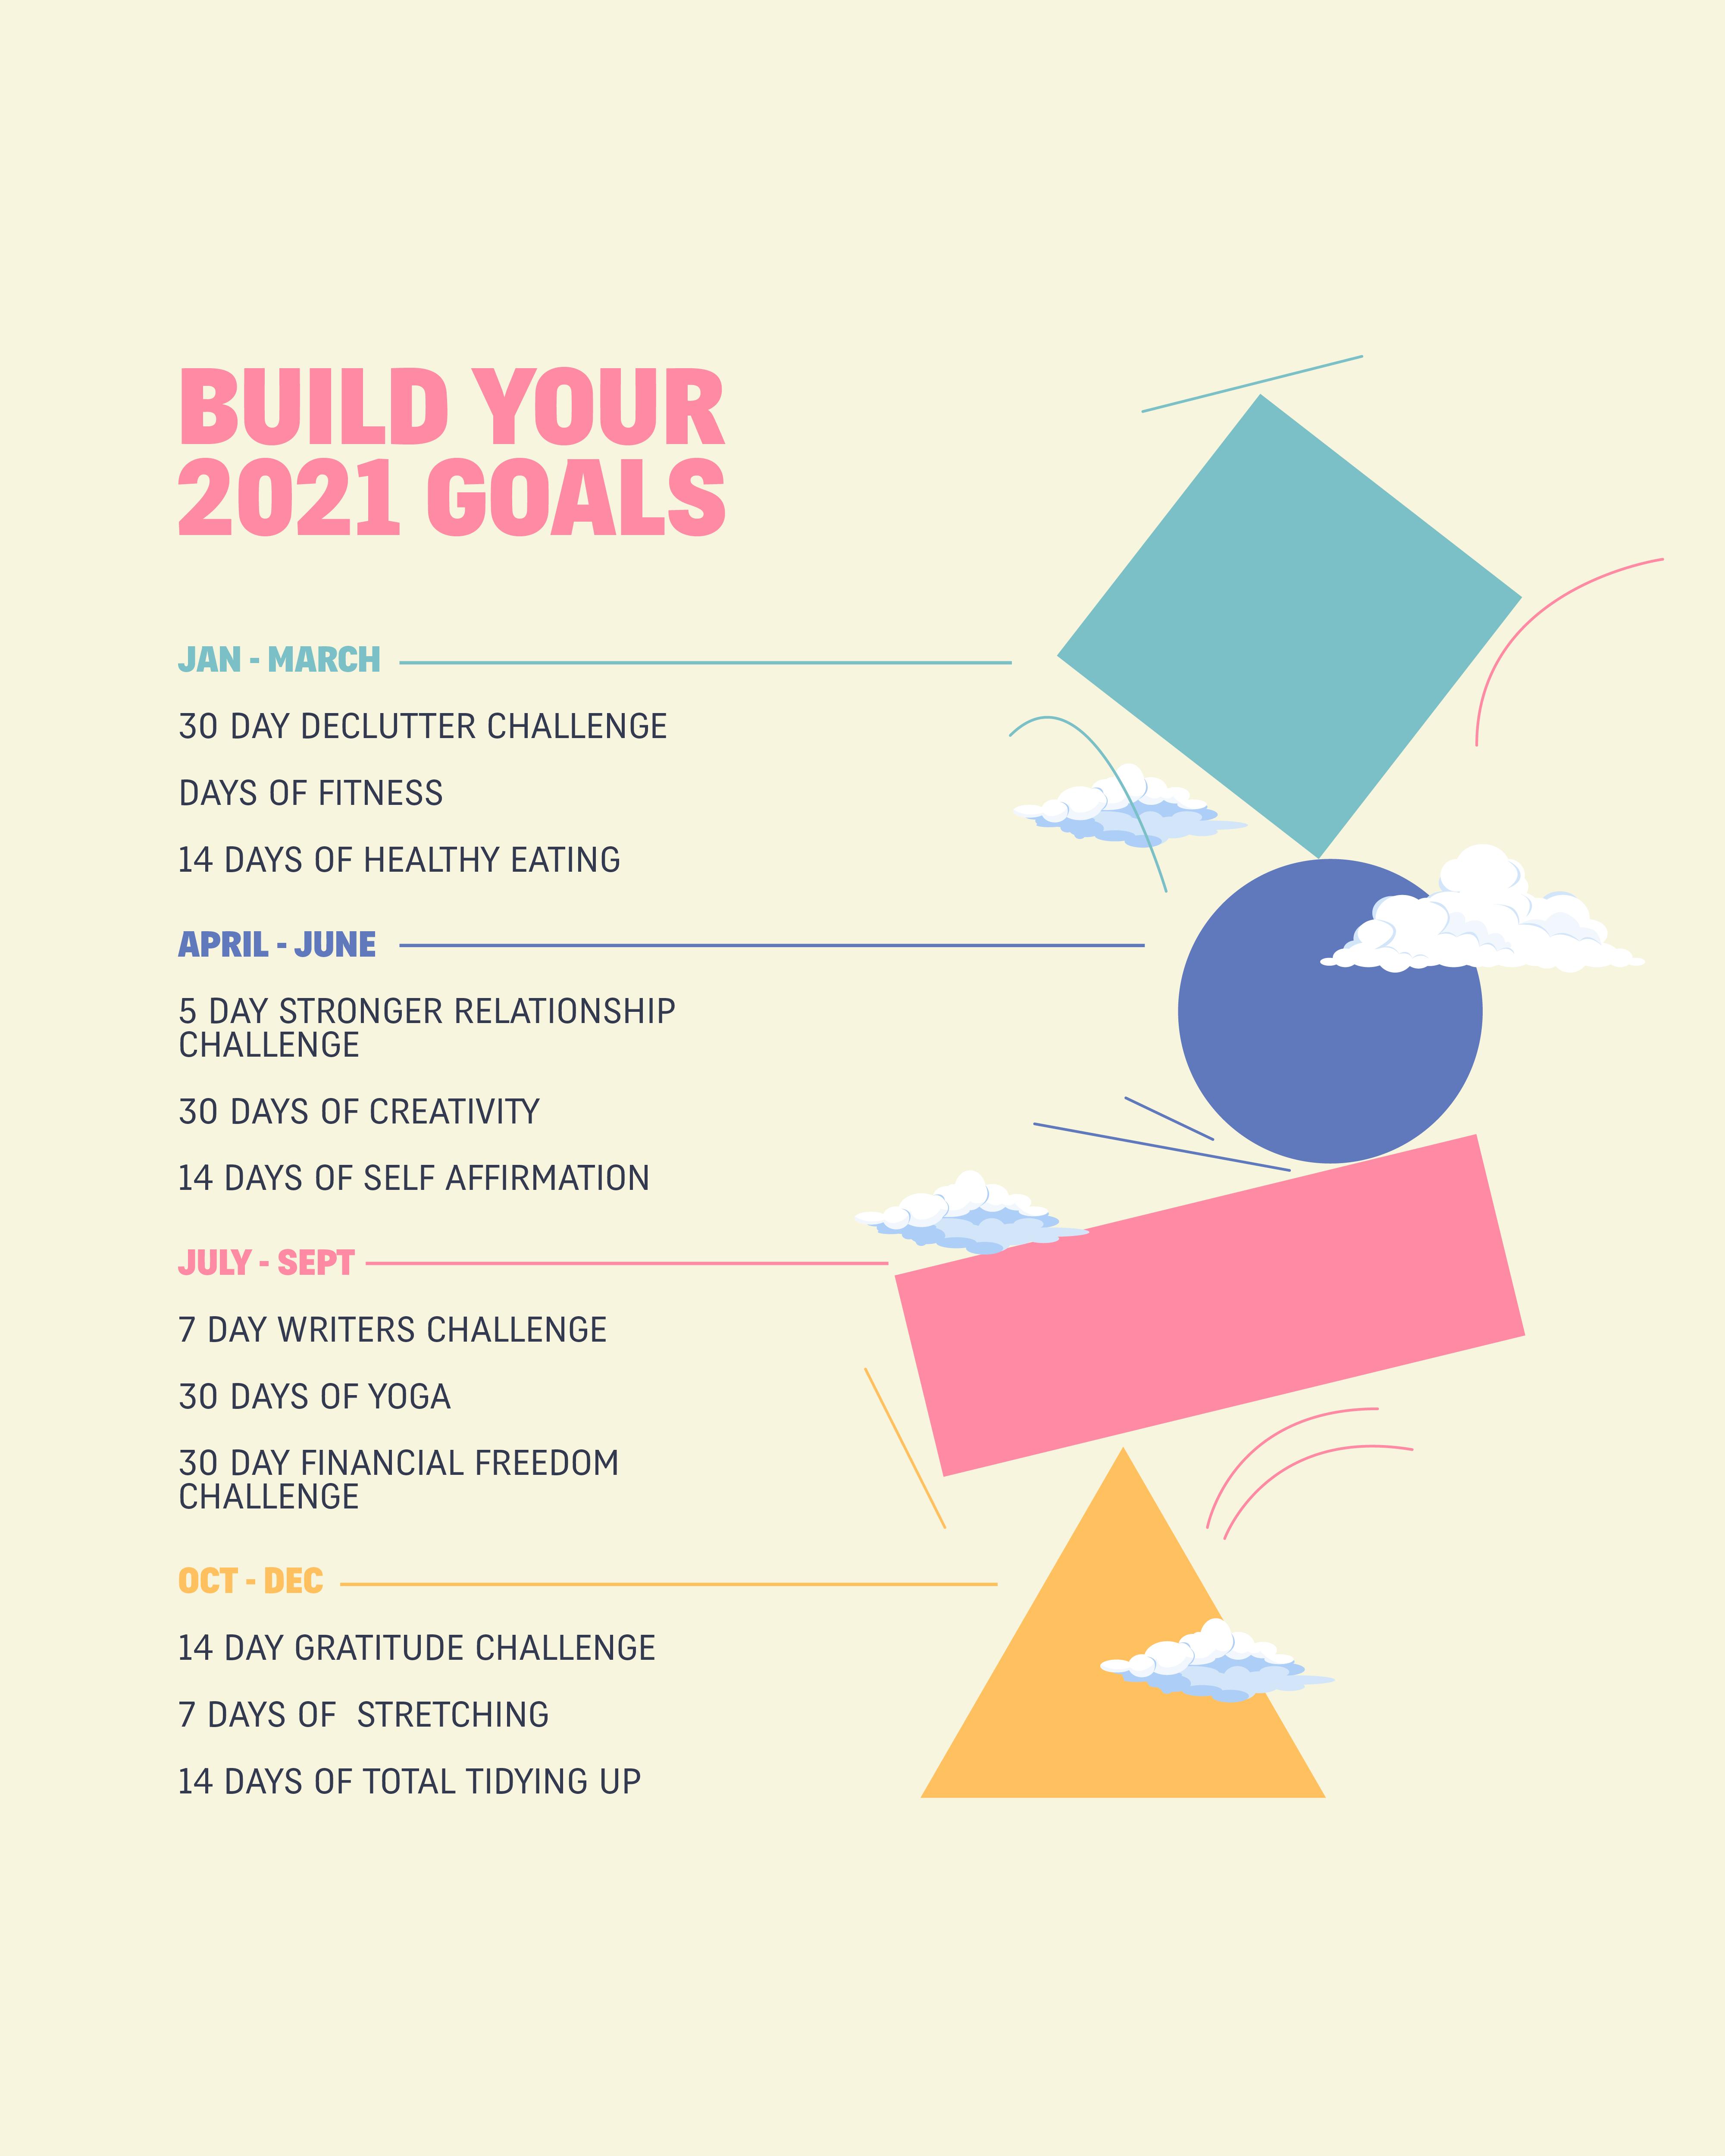 Build Your 2021 Goals